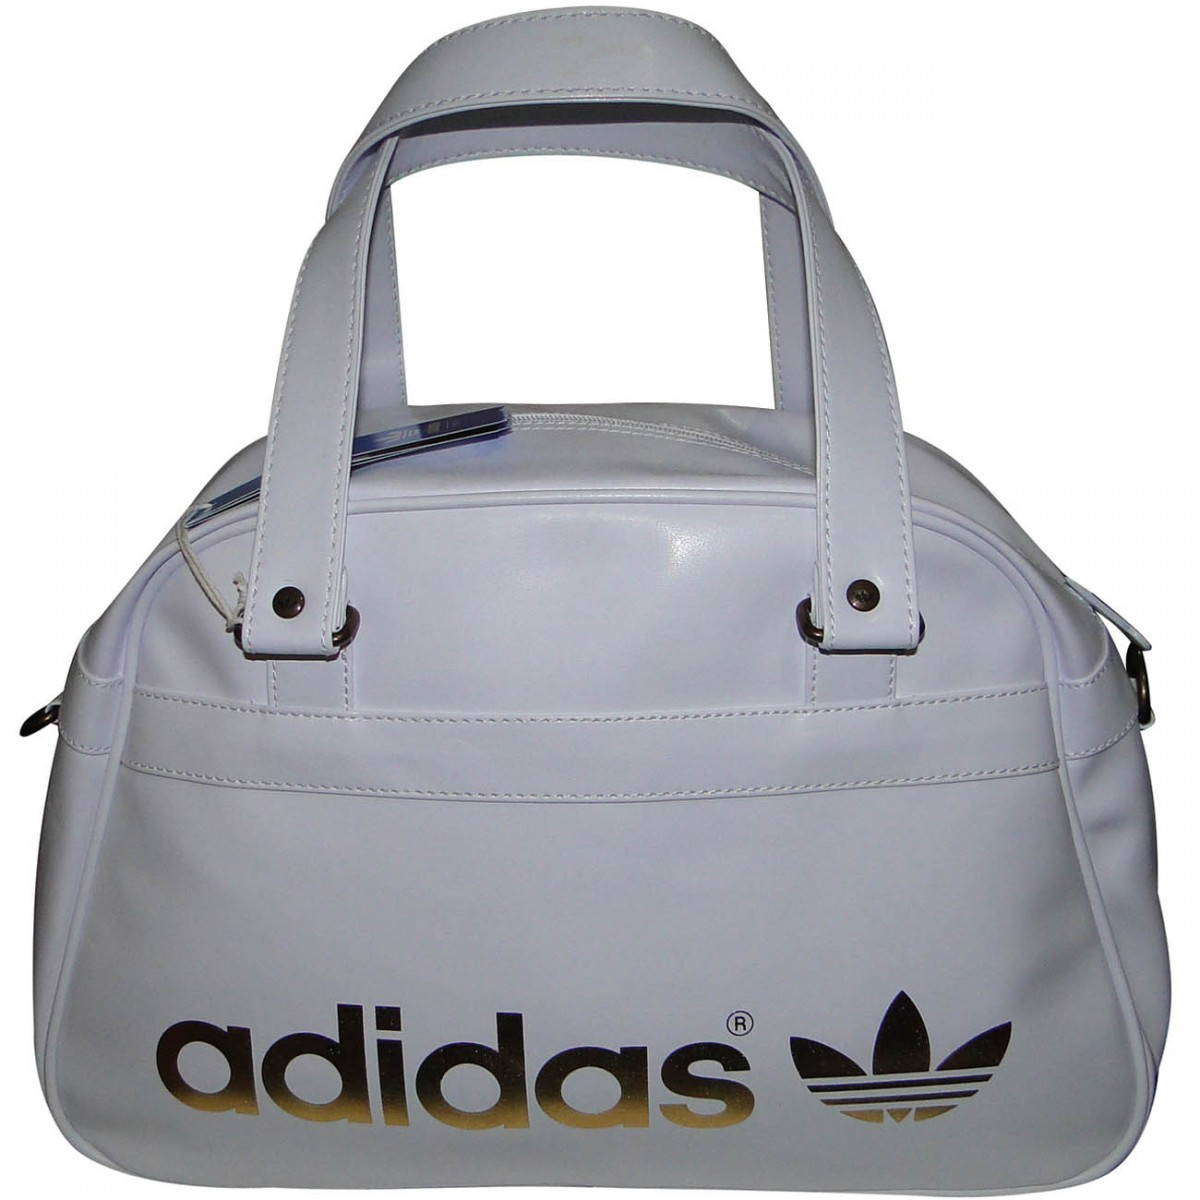 Hqdsxrtc 5566 Adidas Adicolor Nike Bowling Bolsa Brancodourado Chuteira PX0wkNOn8